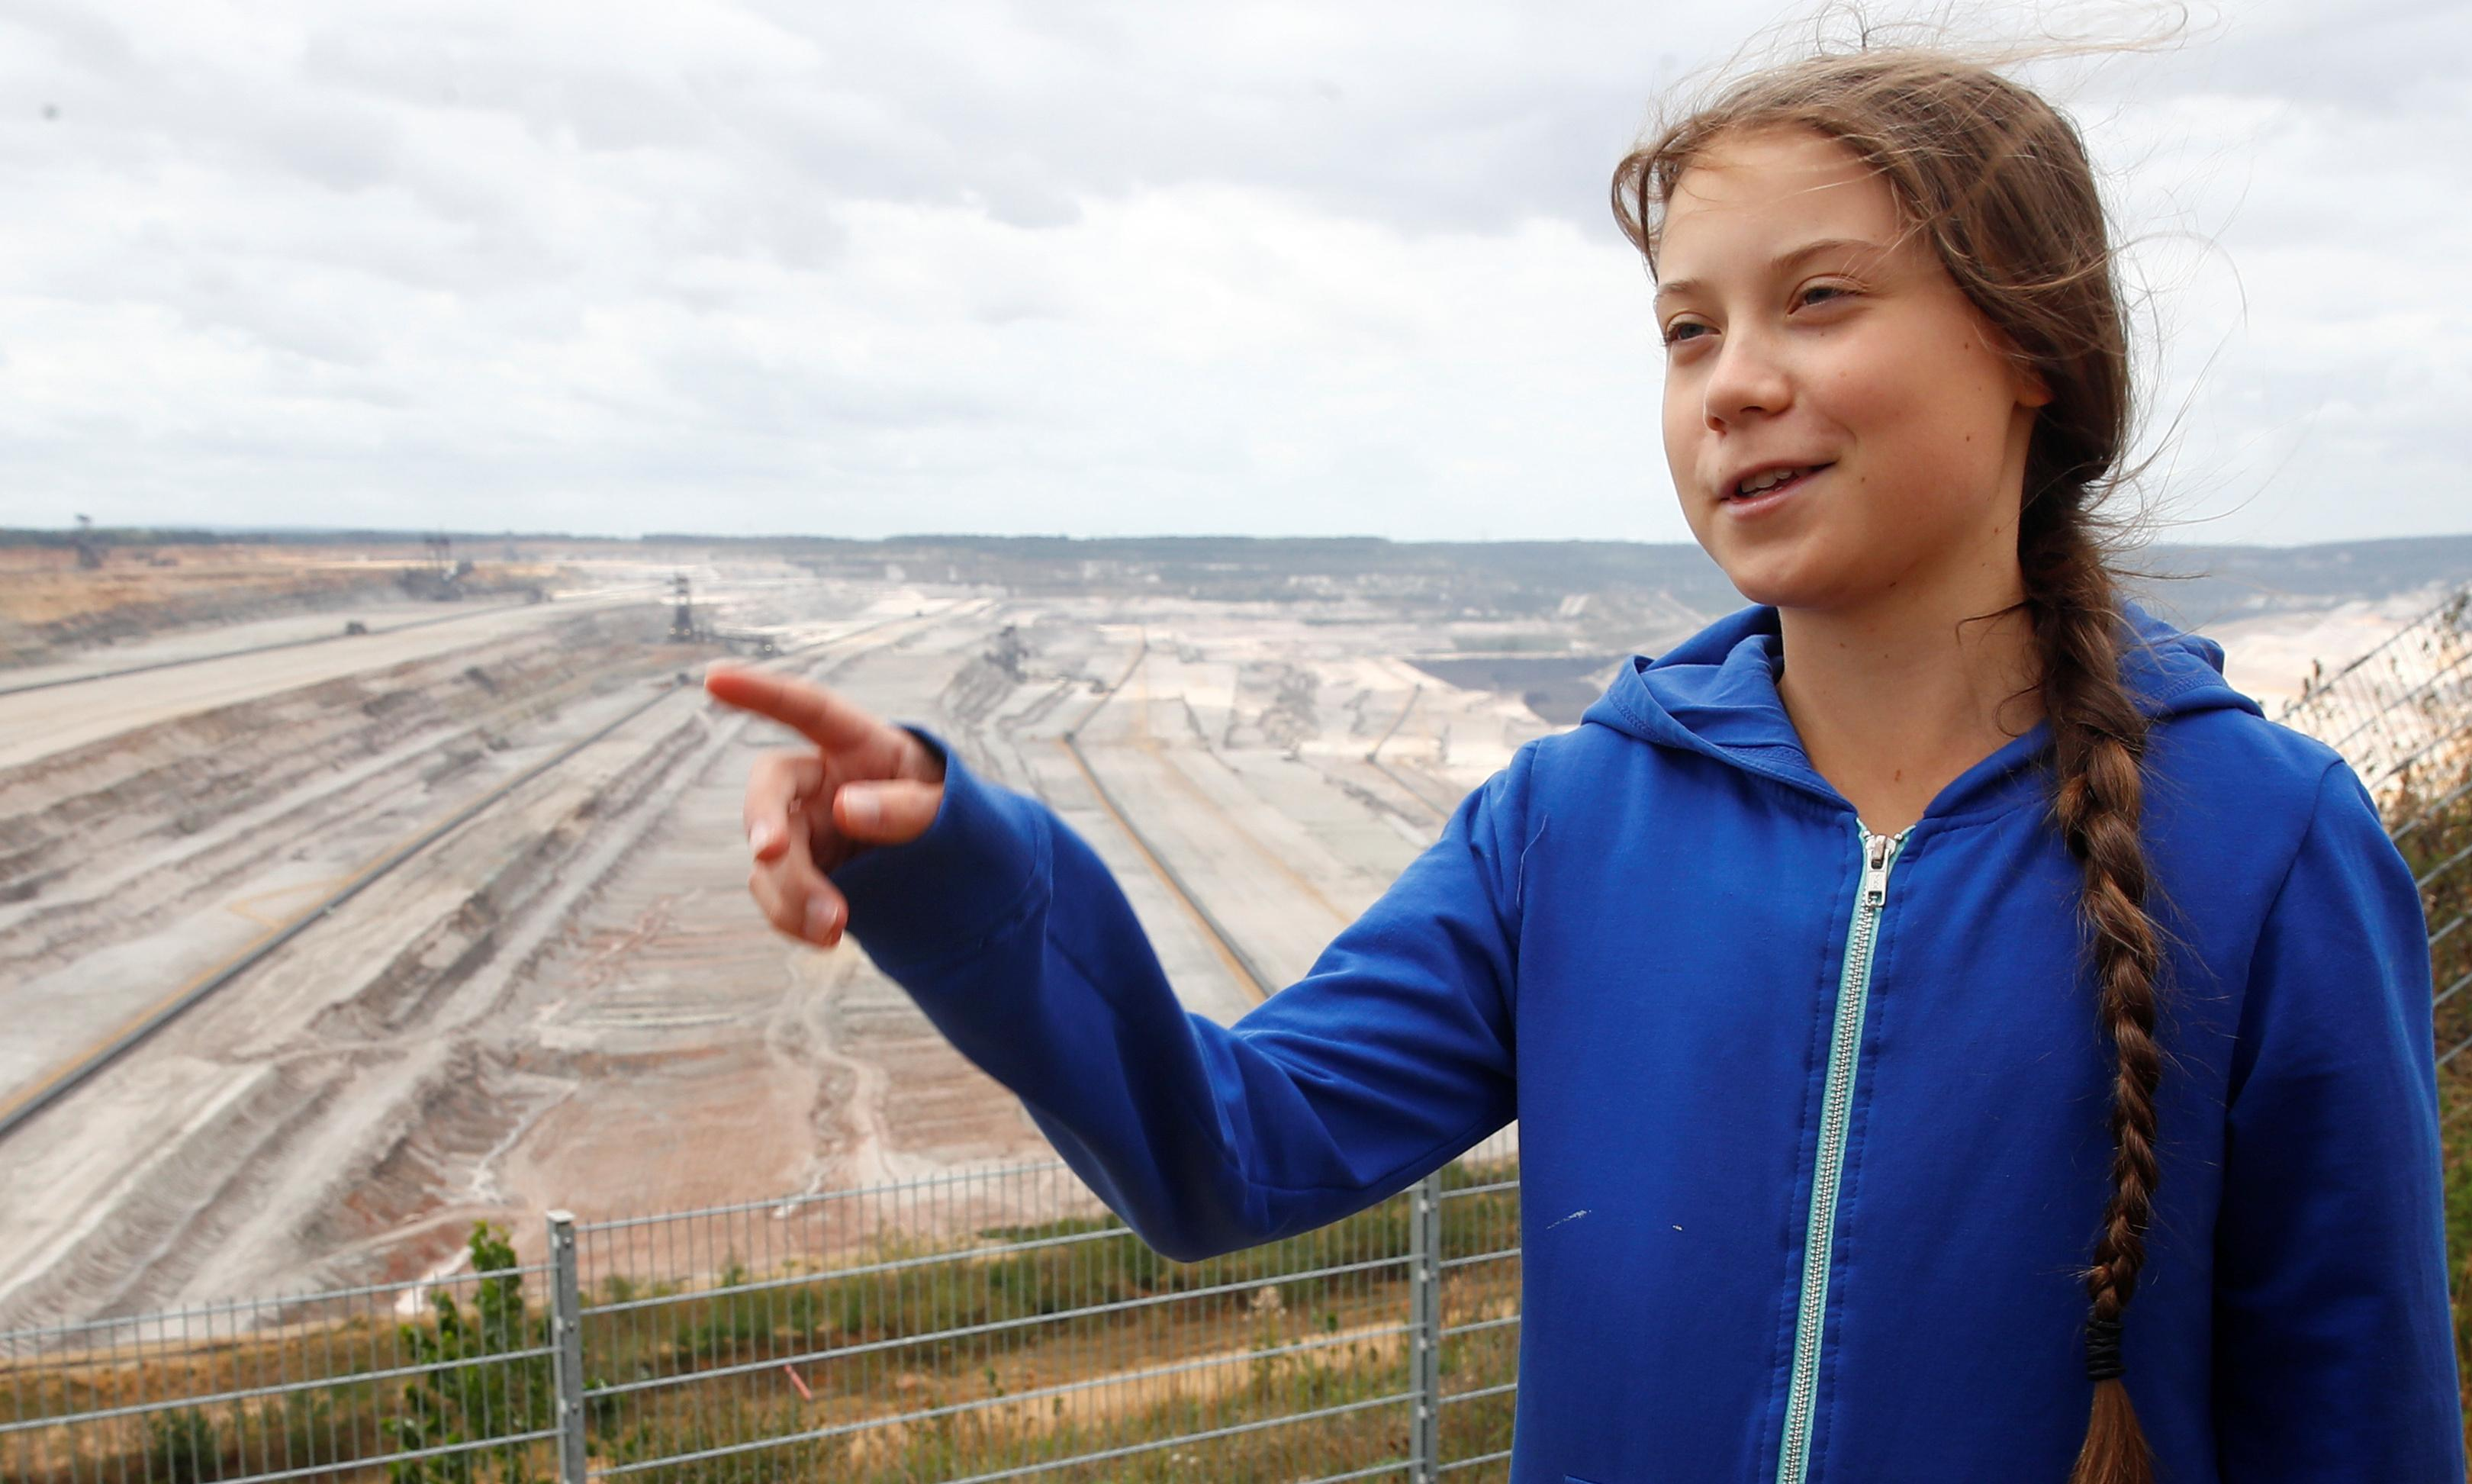 'Greta effect' leads to boom in children's environmental books